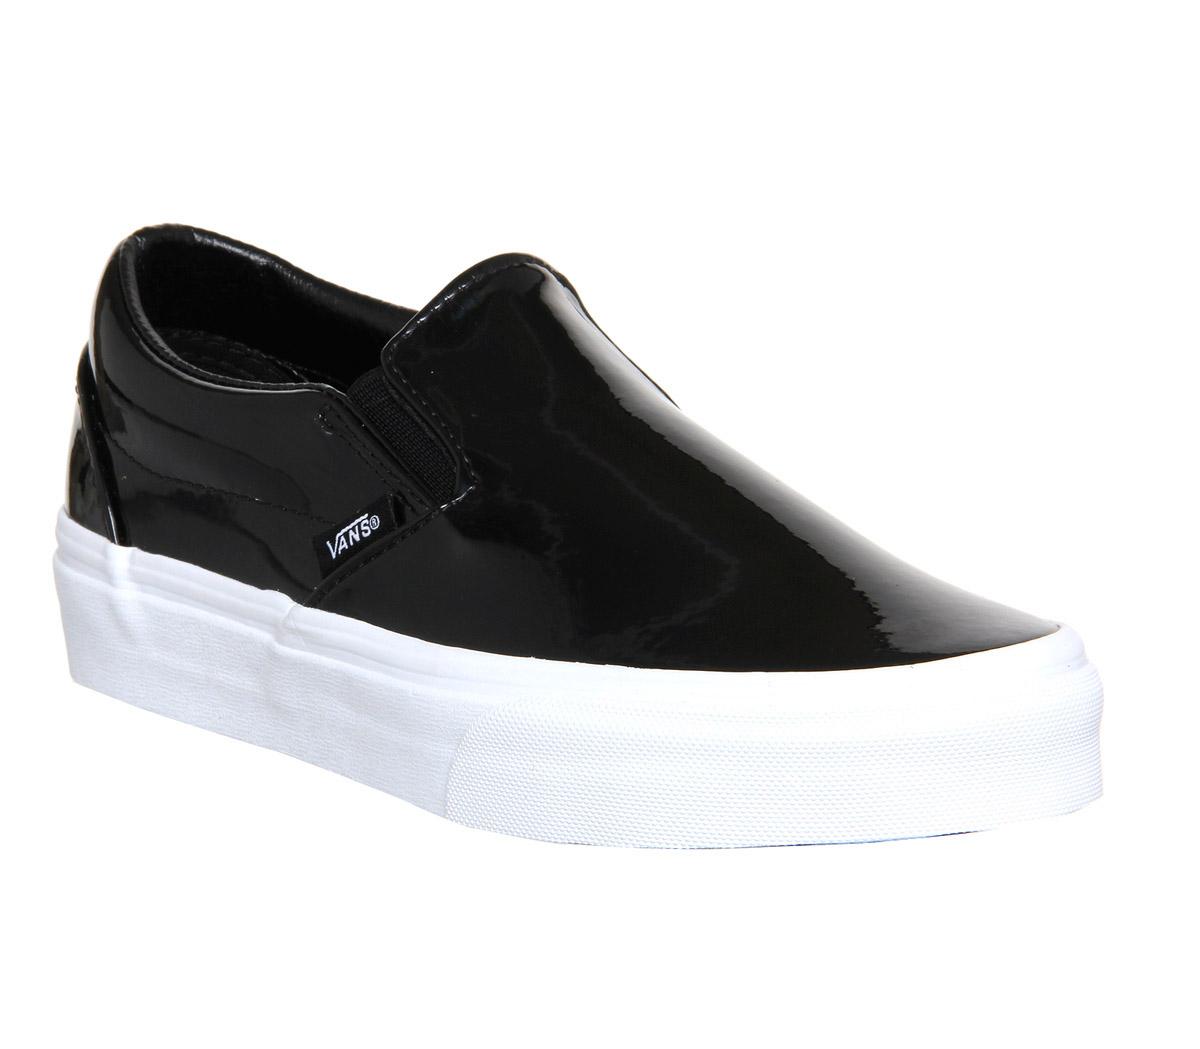 mens vans vans classic slip on patent leather black trainers shoes. Black Bedroom Furniture Sets. Home Design Ideas